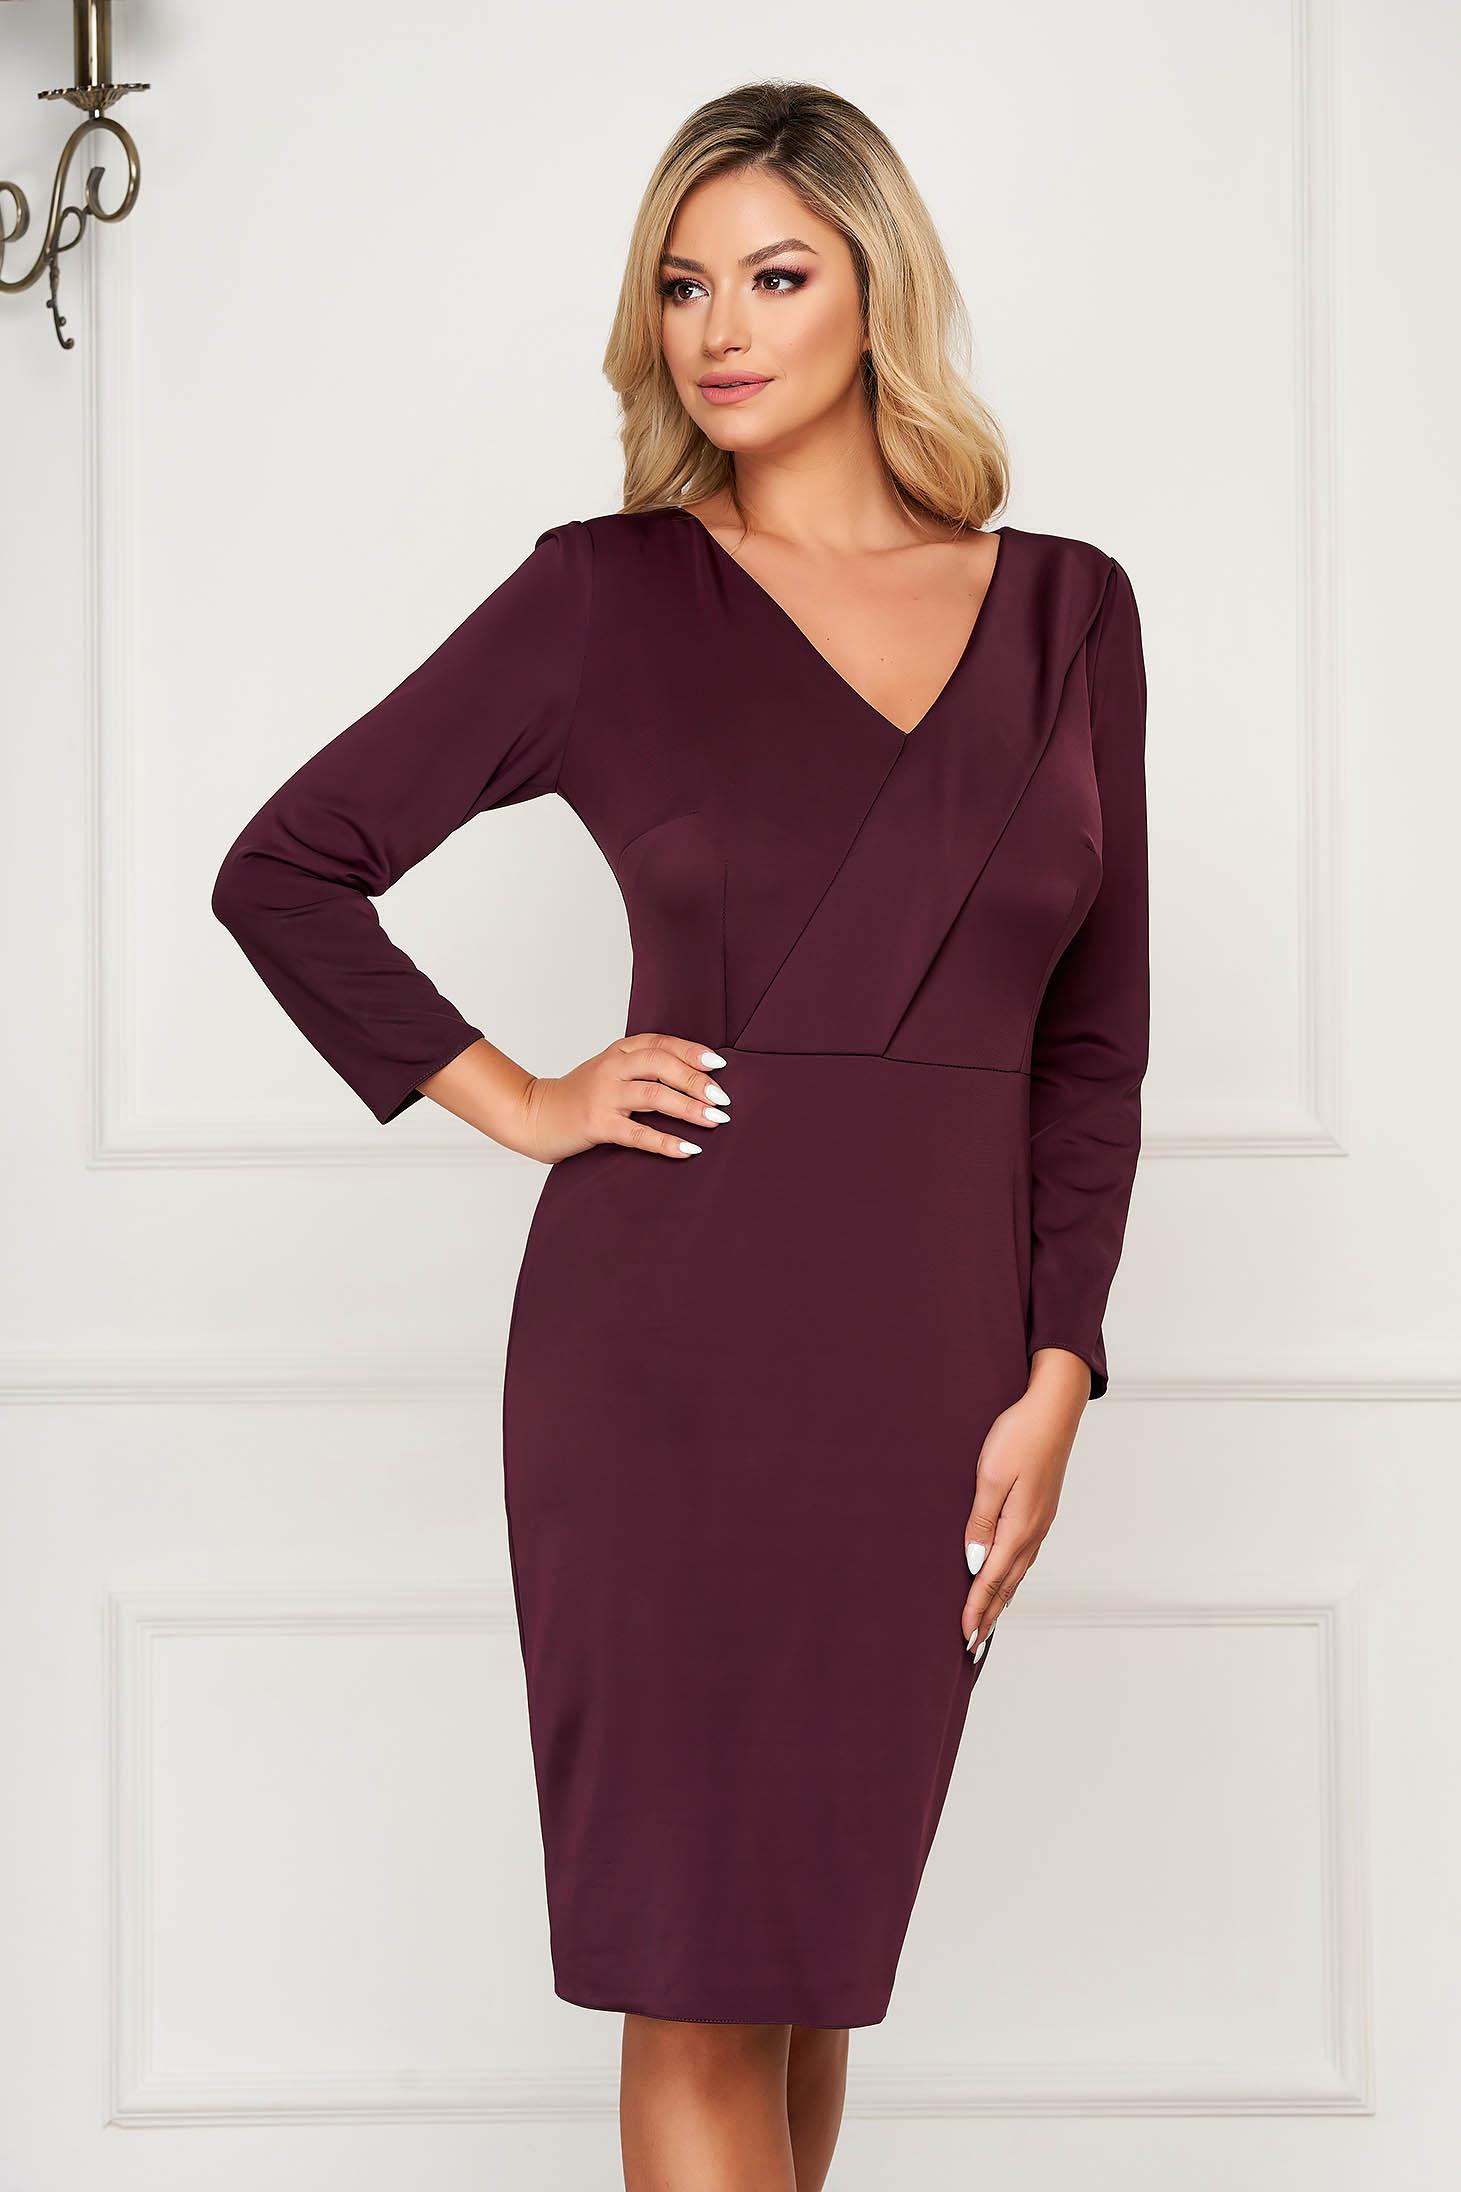 Burgundy elegant pencil dress slightly elastic fabric with inside lining with v-neckline